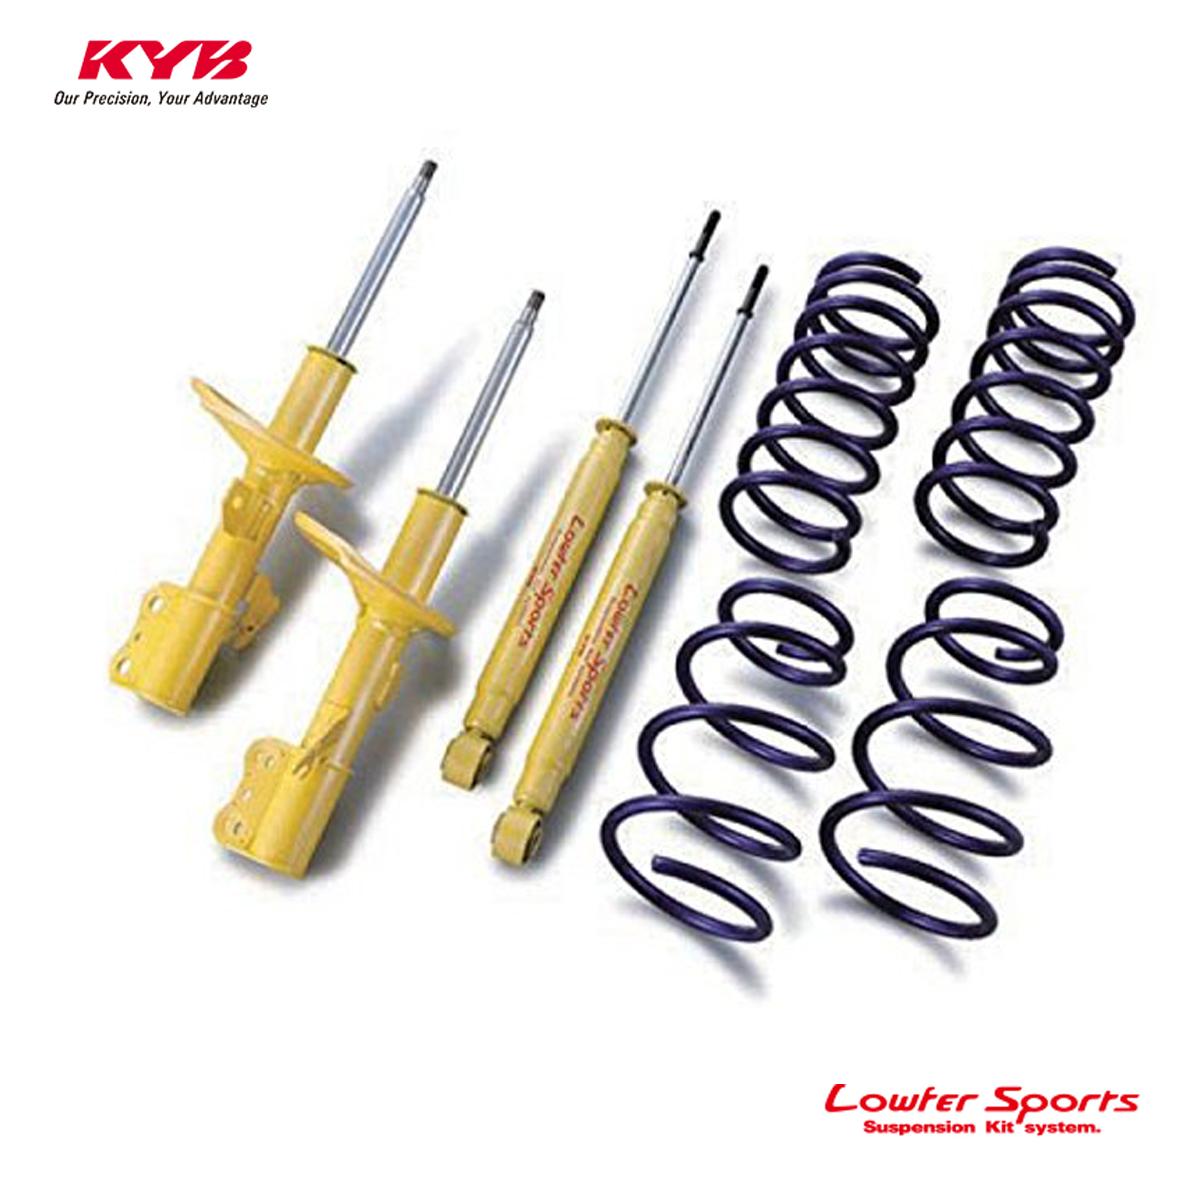 KYB カヤバ カローラフィルダー ZRE162G ショックアブソーバー サスペンションキット Lowfer Sports LKIT-ZRE162G 配送先条件有り